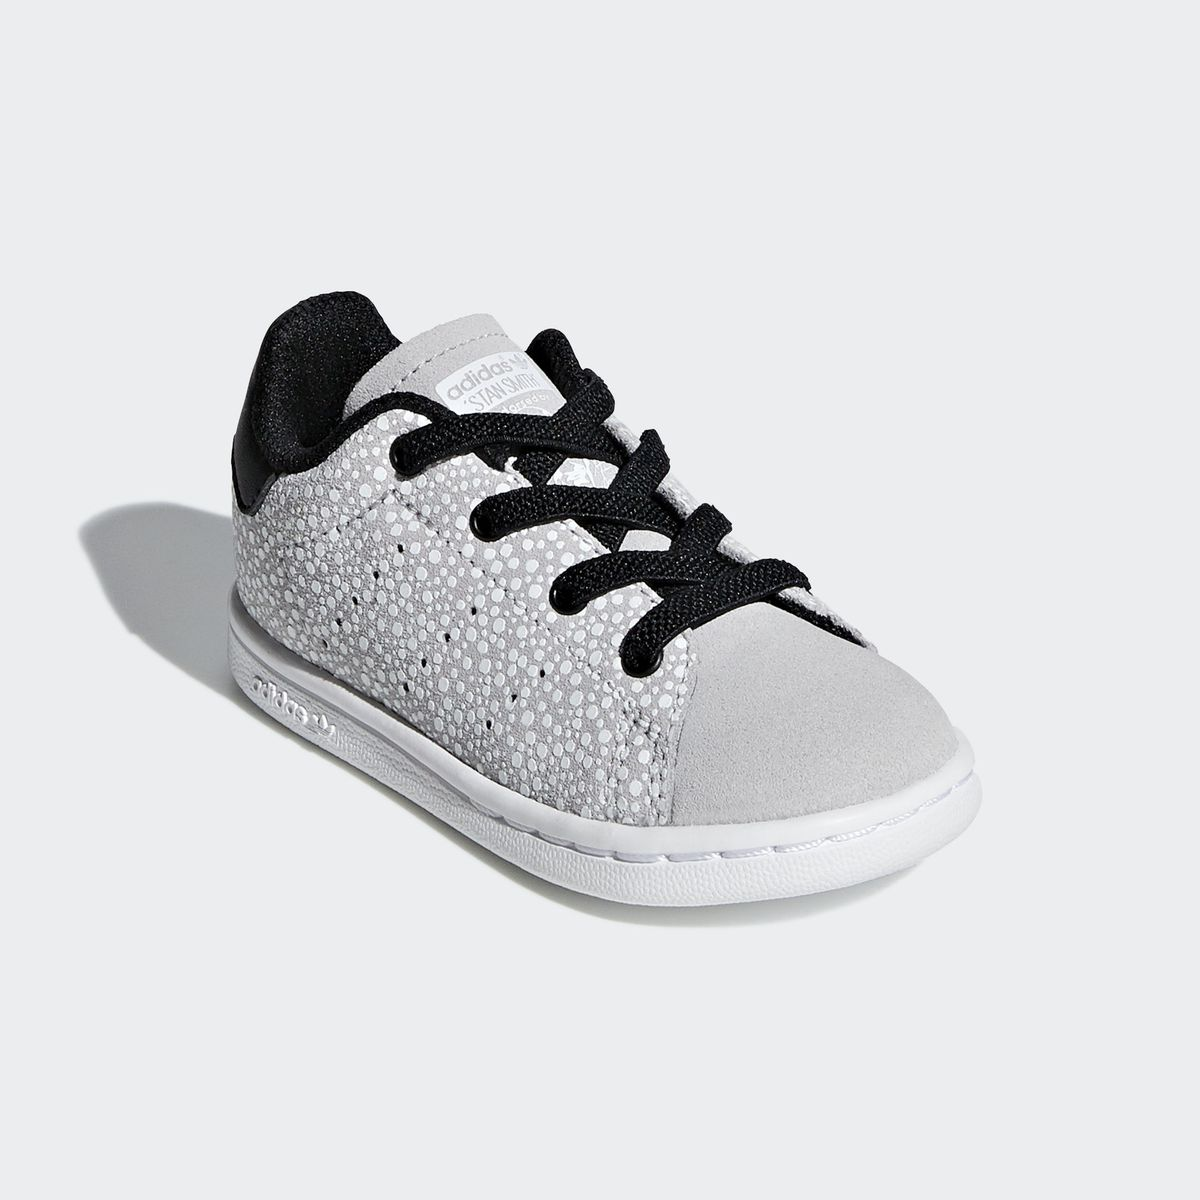 adidas stan smith taille 27